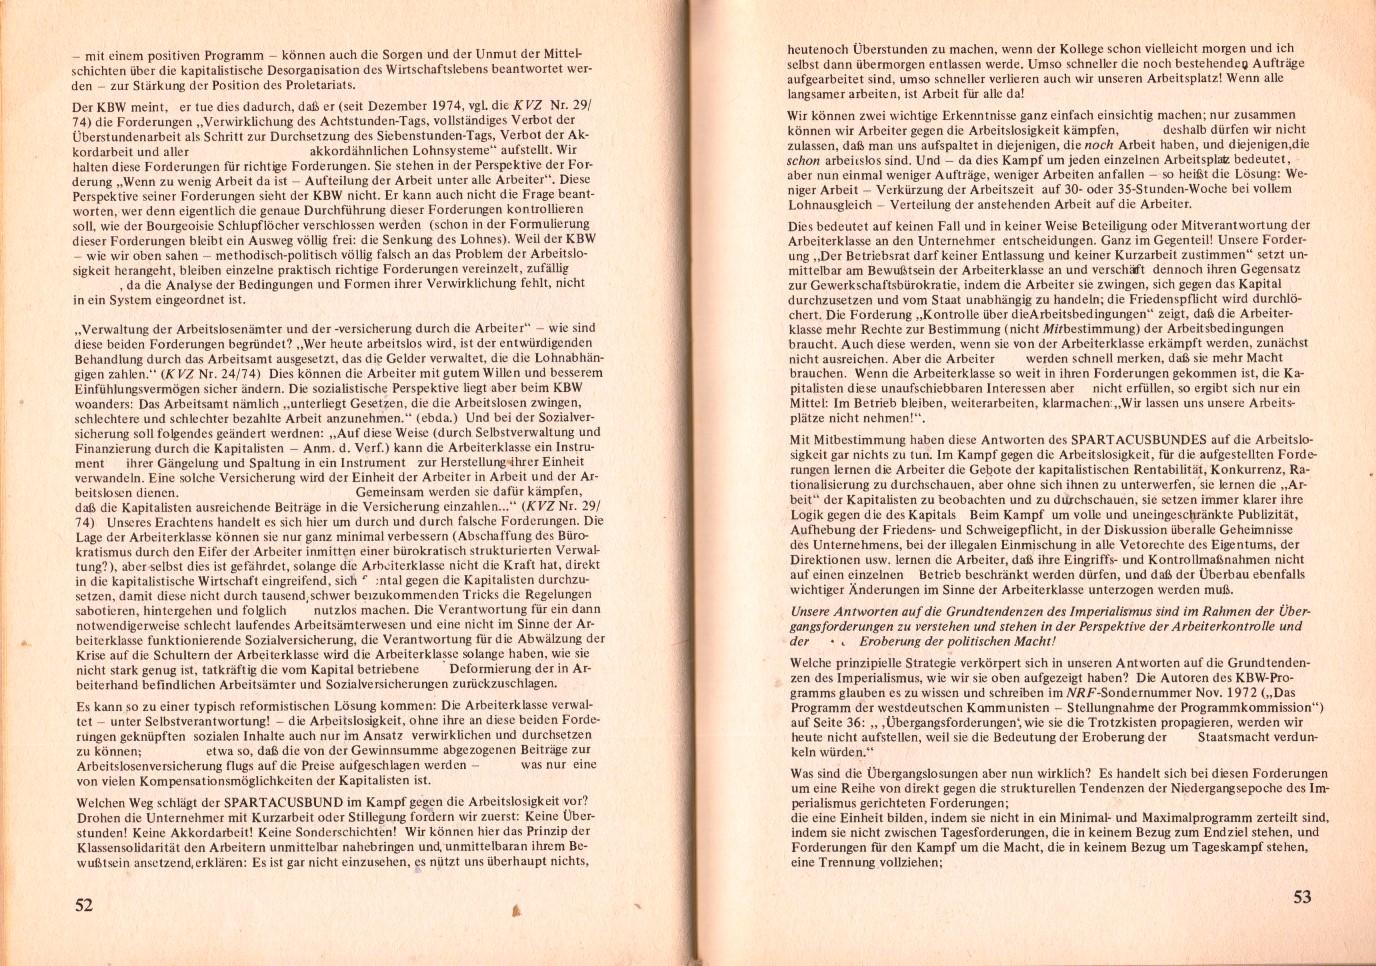 Spartacus_1975_Kritik_des_KBW_28